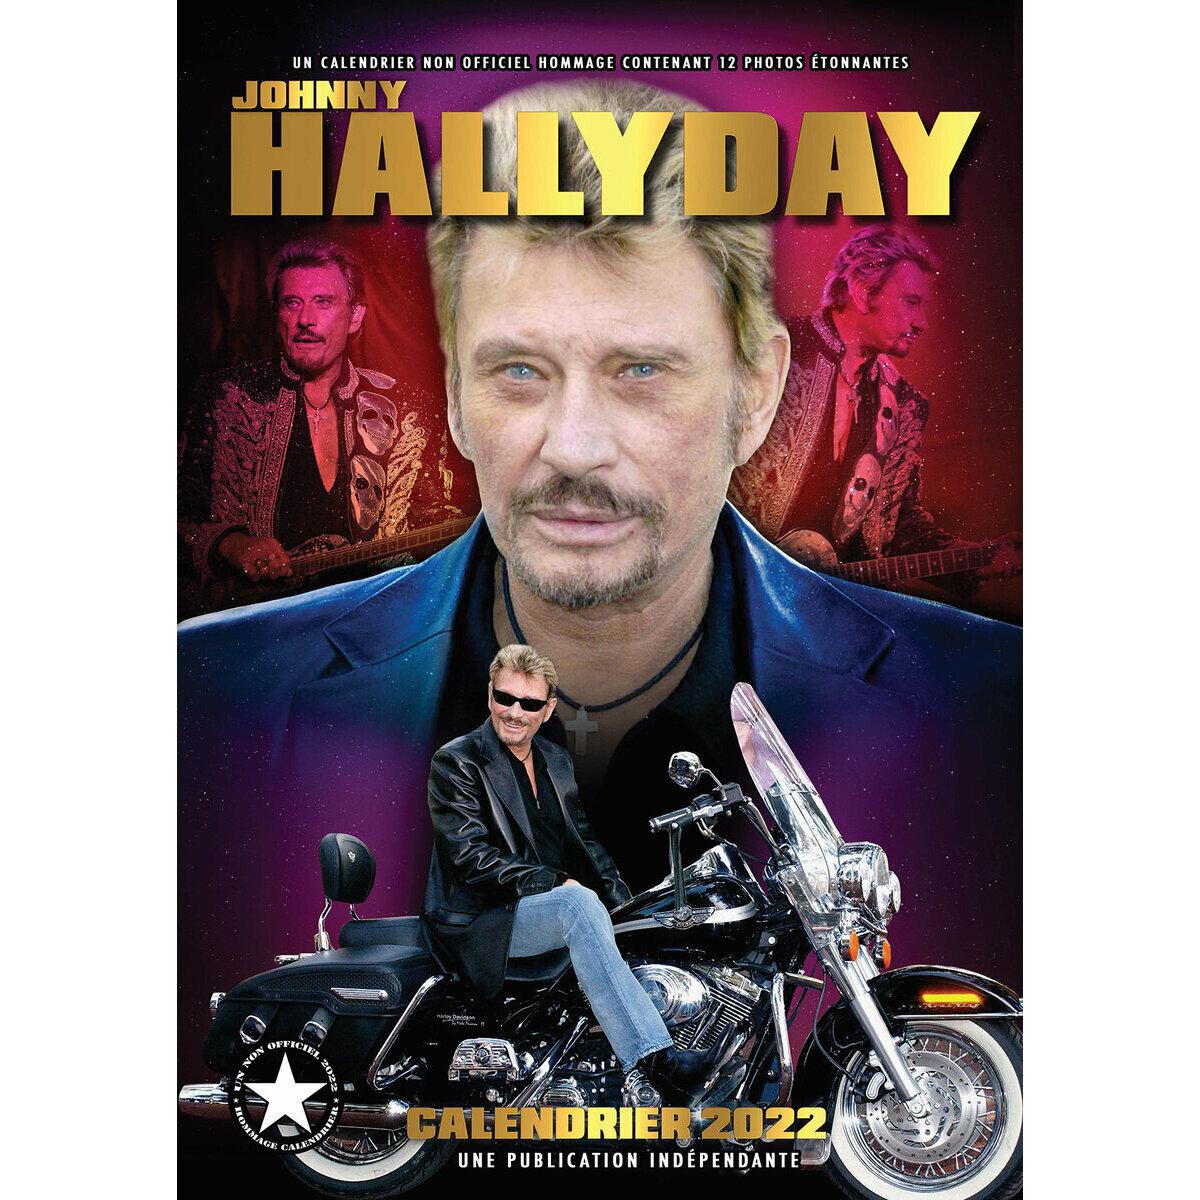 Calendrier Johnny Hallyday 2022 Calendrier 2022 Johnny Hallyday format A3